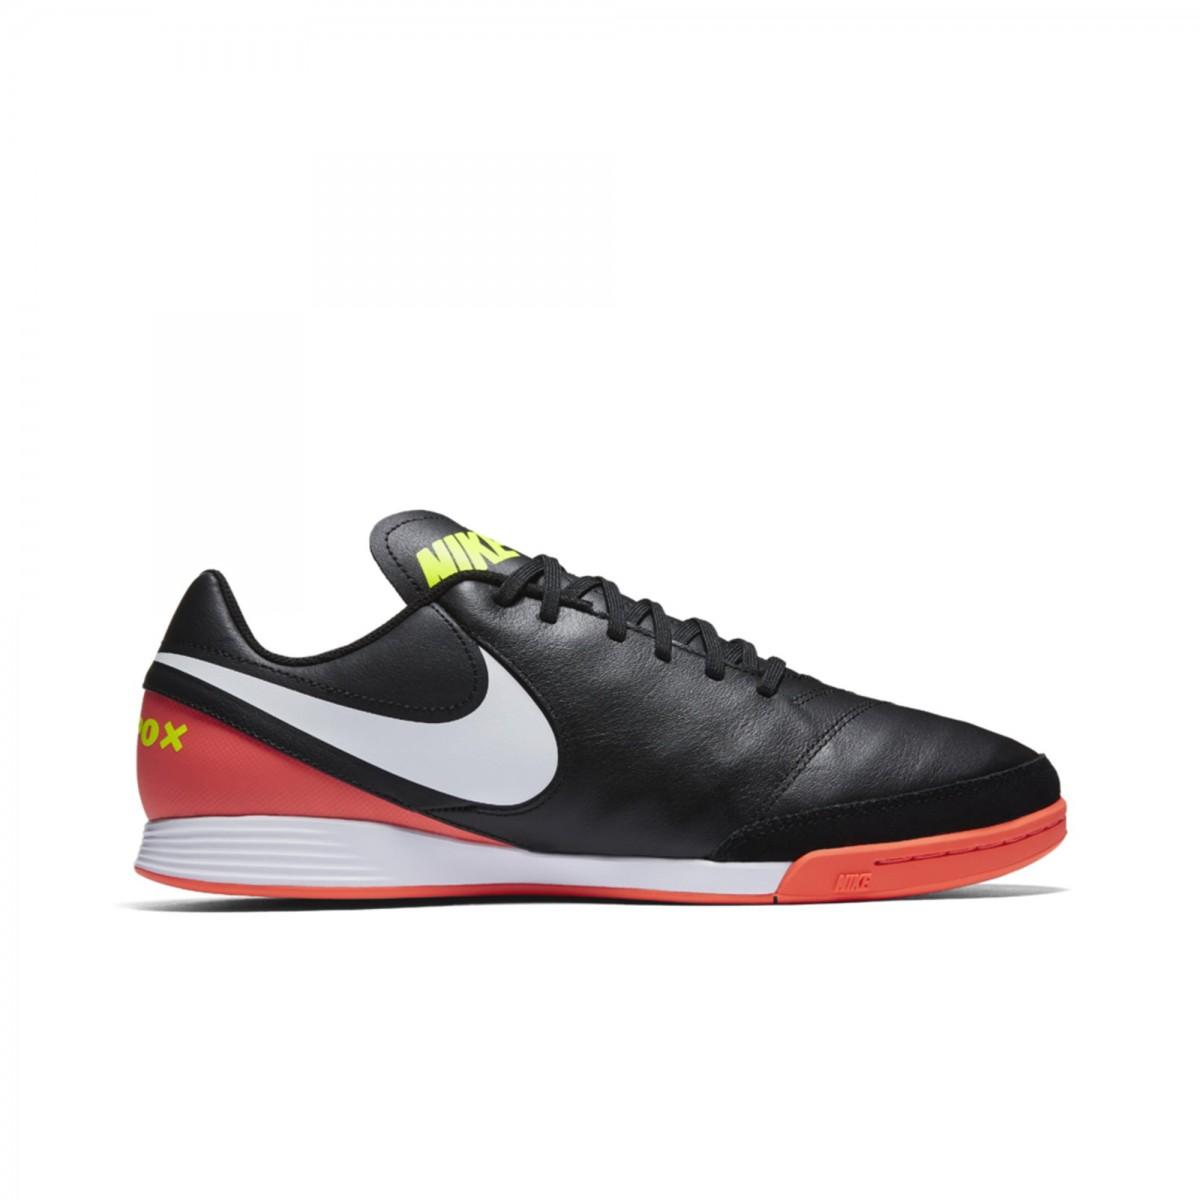 finest selection 09dd4 8ac76 Bizz Store - Chuteira Futsal Nike Tiempo Genio II Leather Ma